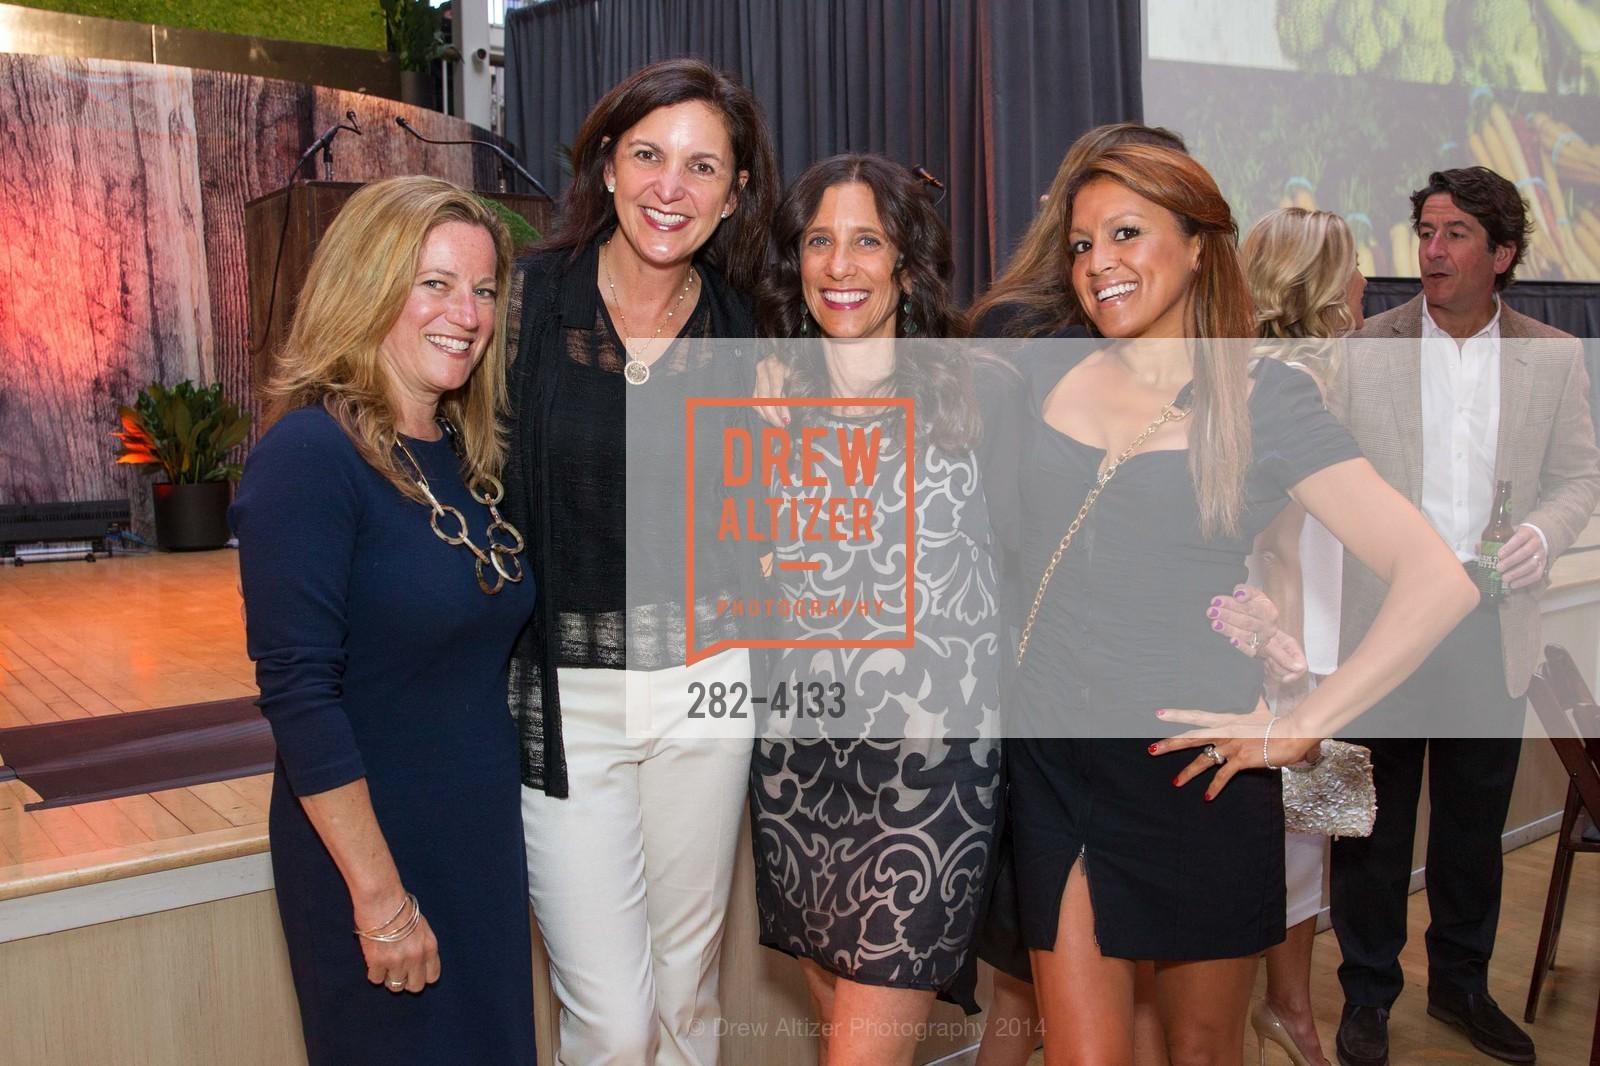 Carolyn Edwards, Jenna Feinberg, Jodi Liano, Nisreen Gardner, Photo #282-4133